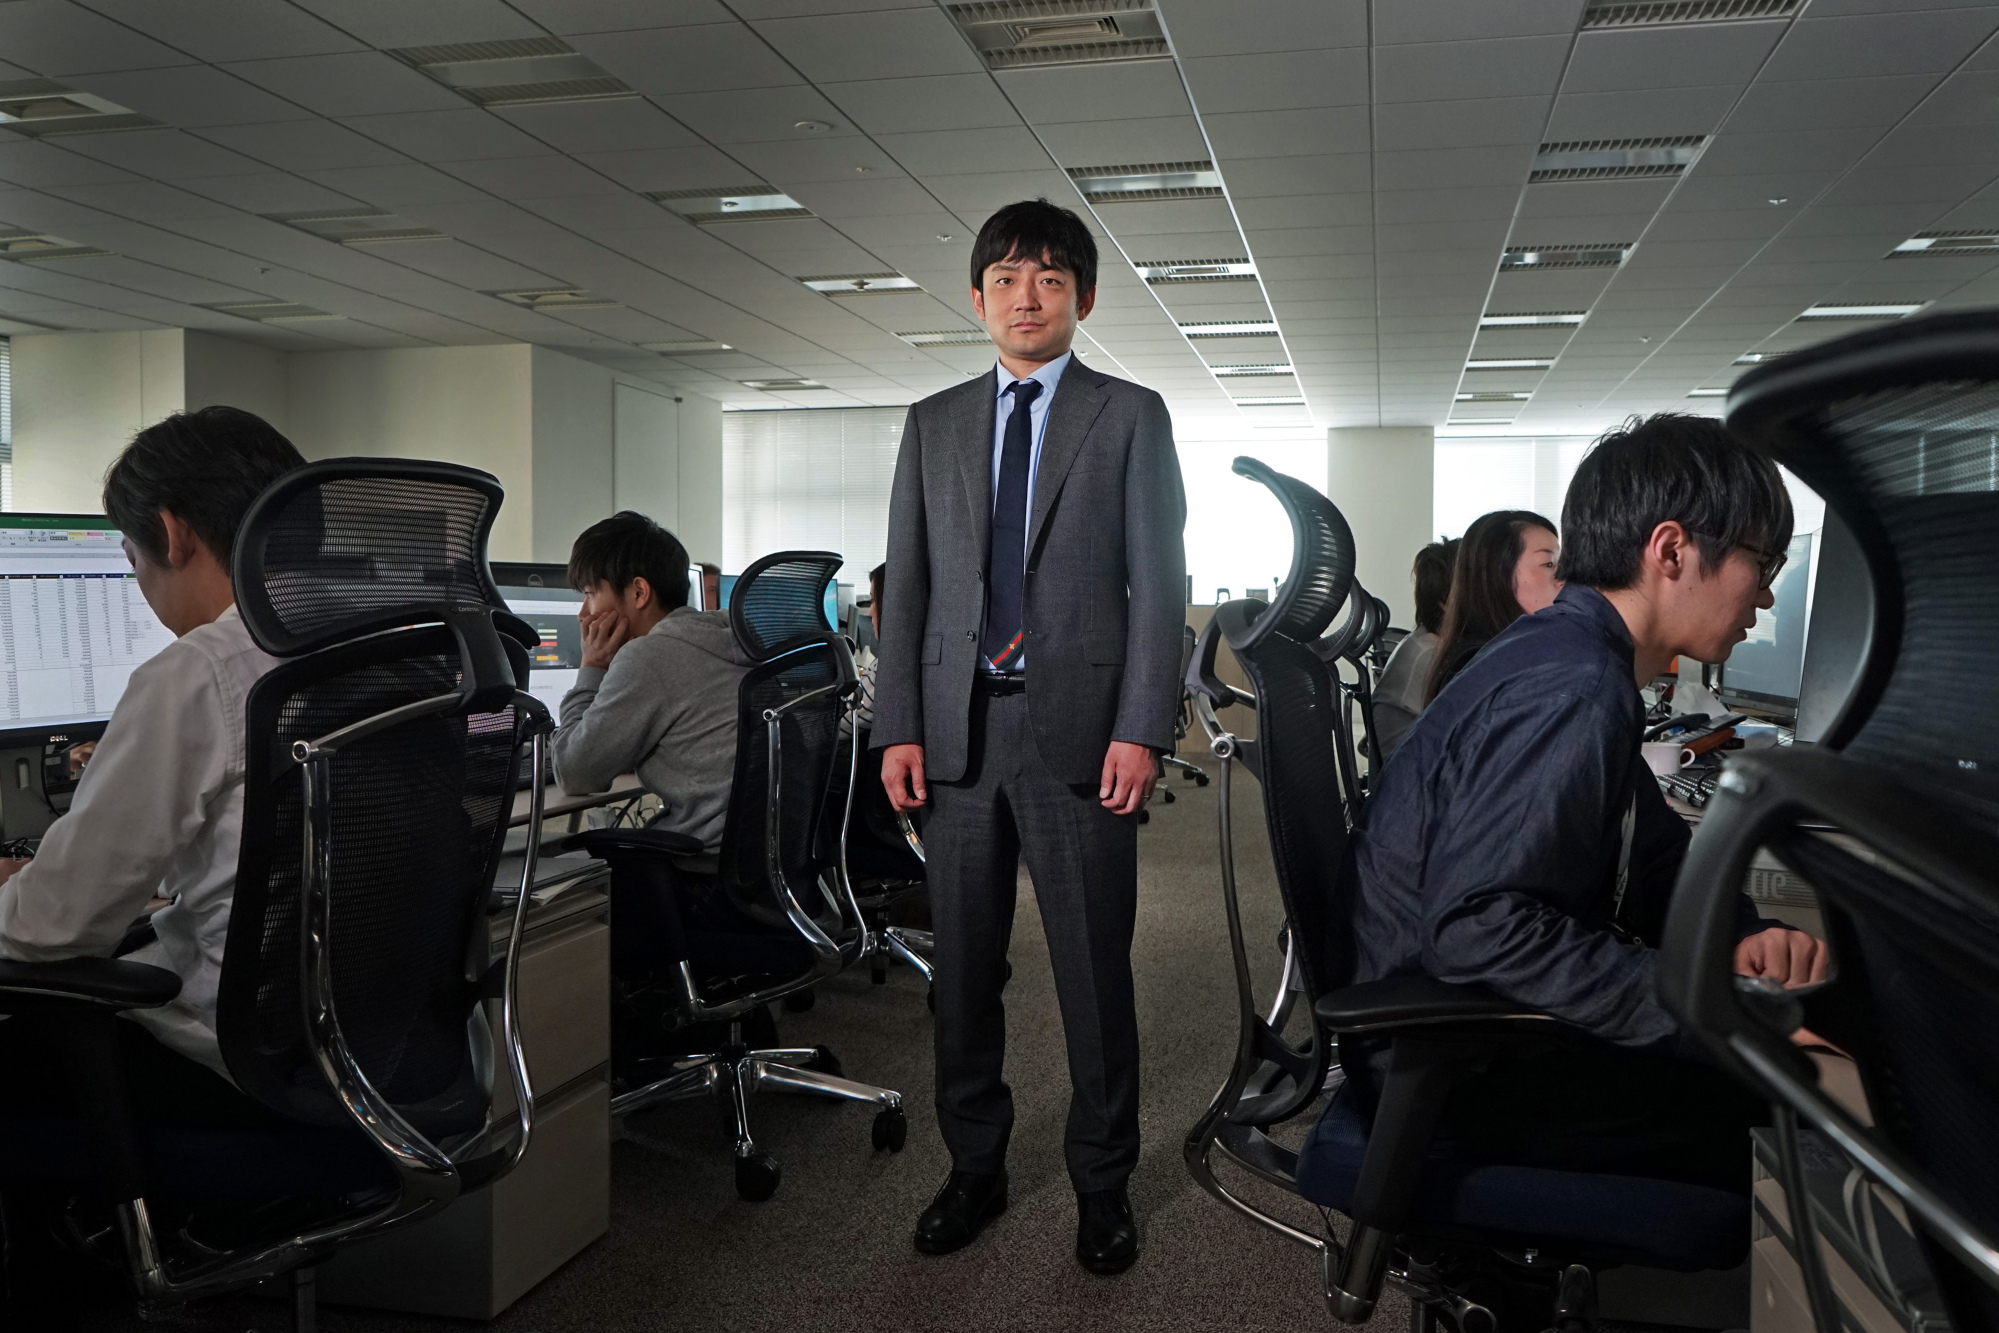 Japan's Bitcoin King Poaches Wall Street Talent for Crypto Empire